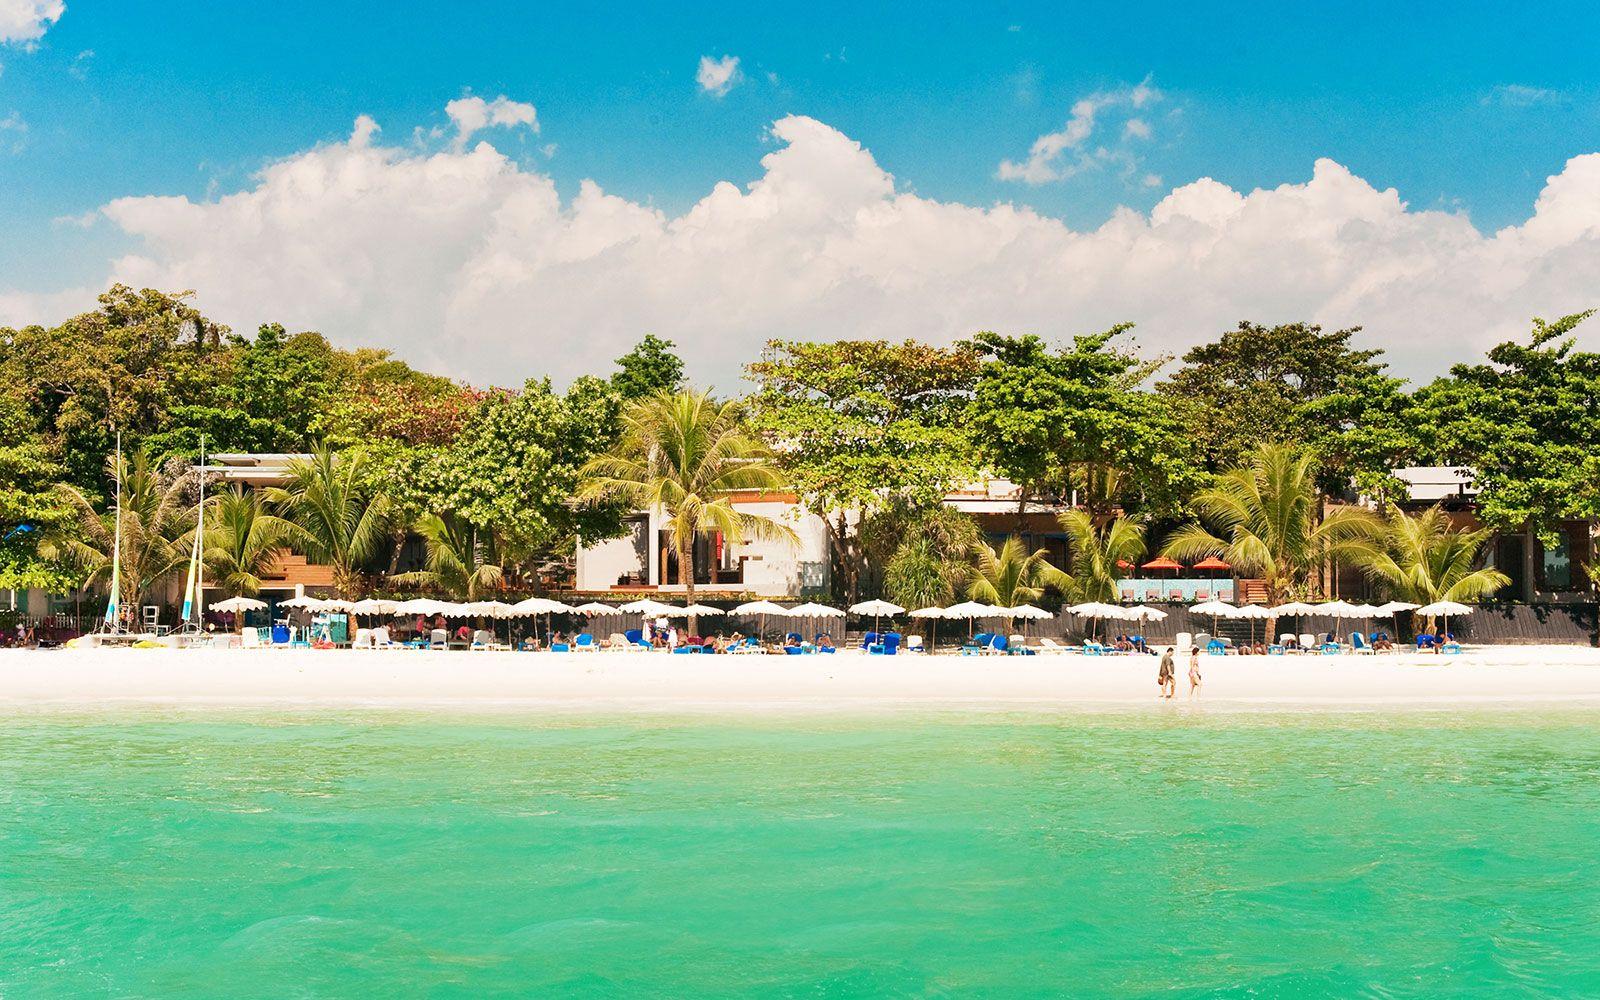 Samed Resorts Sai Kaew Beach Resort On Samet Island